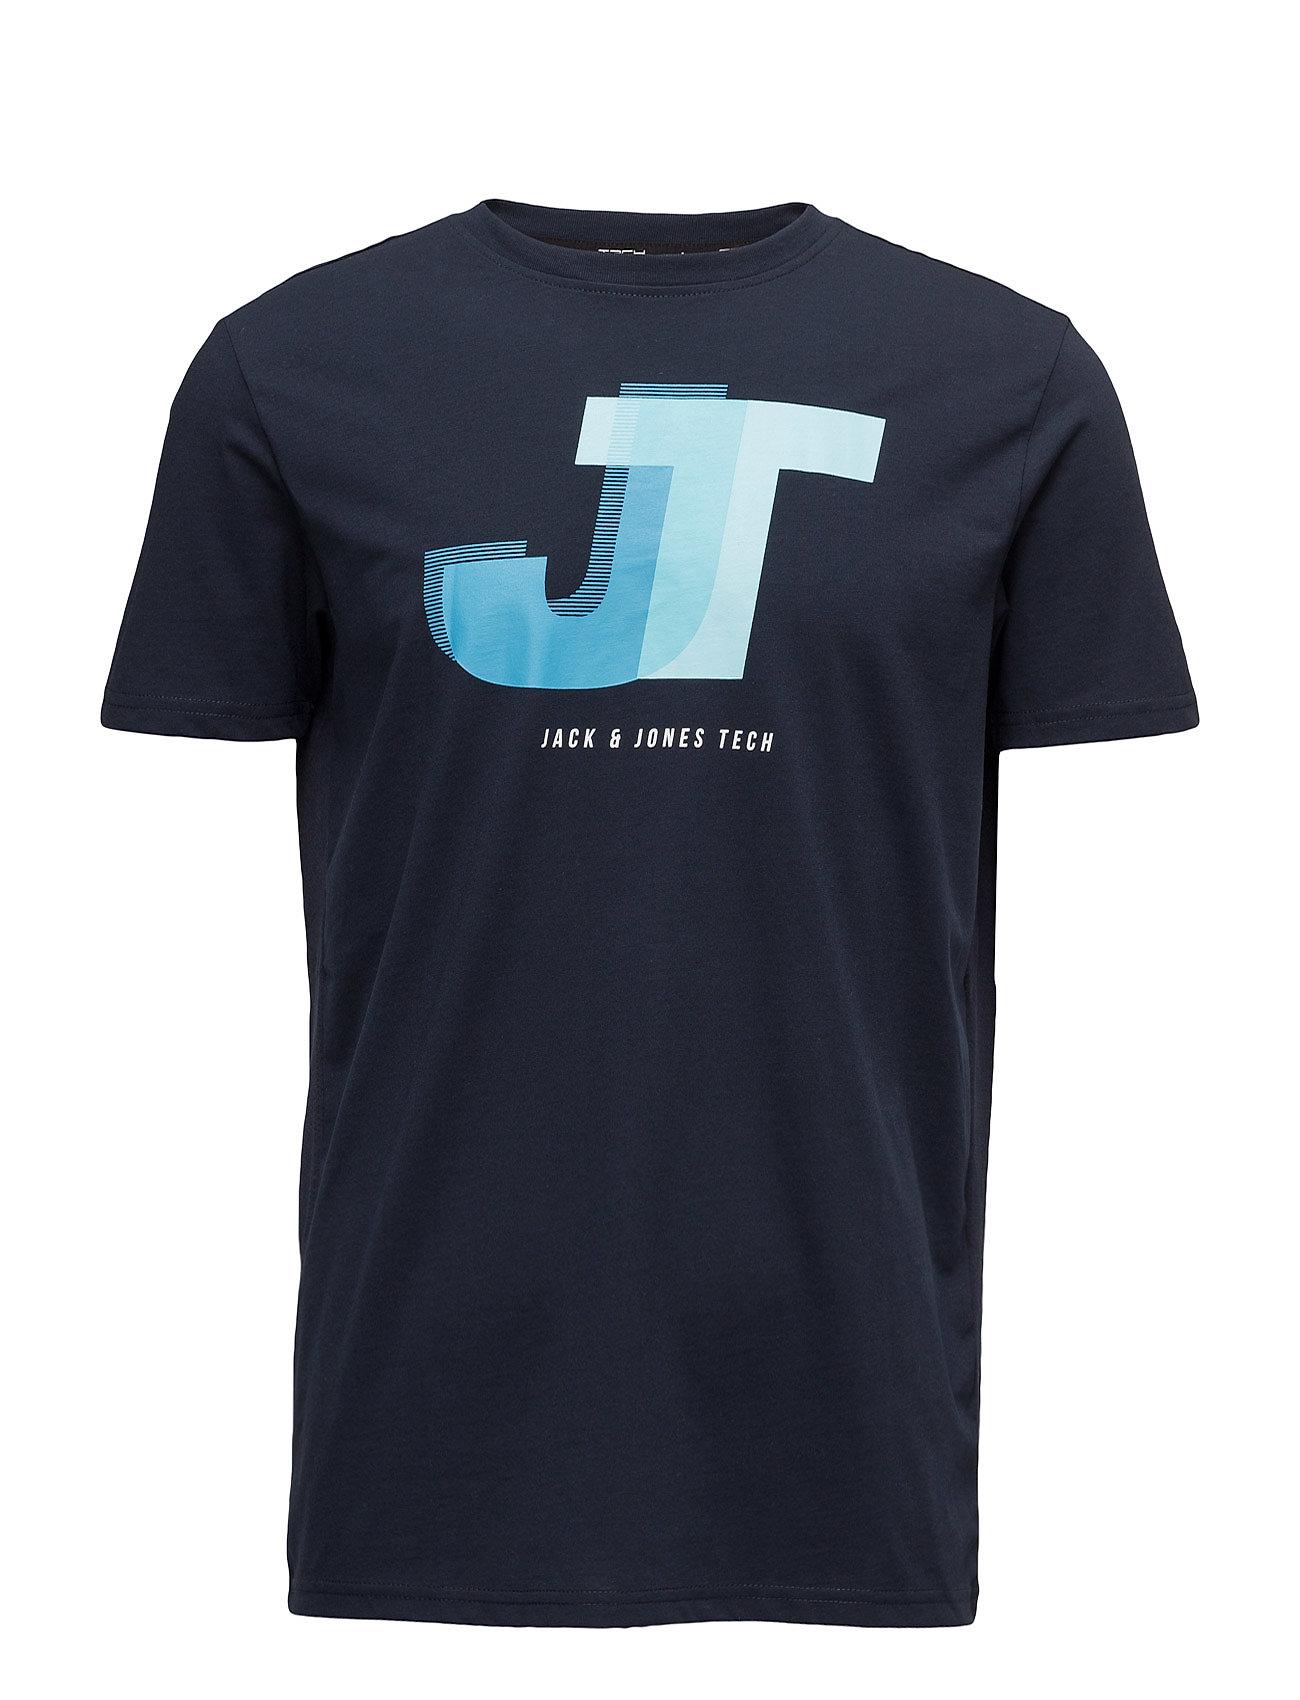 jack & jones tech – Jjtexact tee ss crew neck fra boozt.com dk